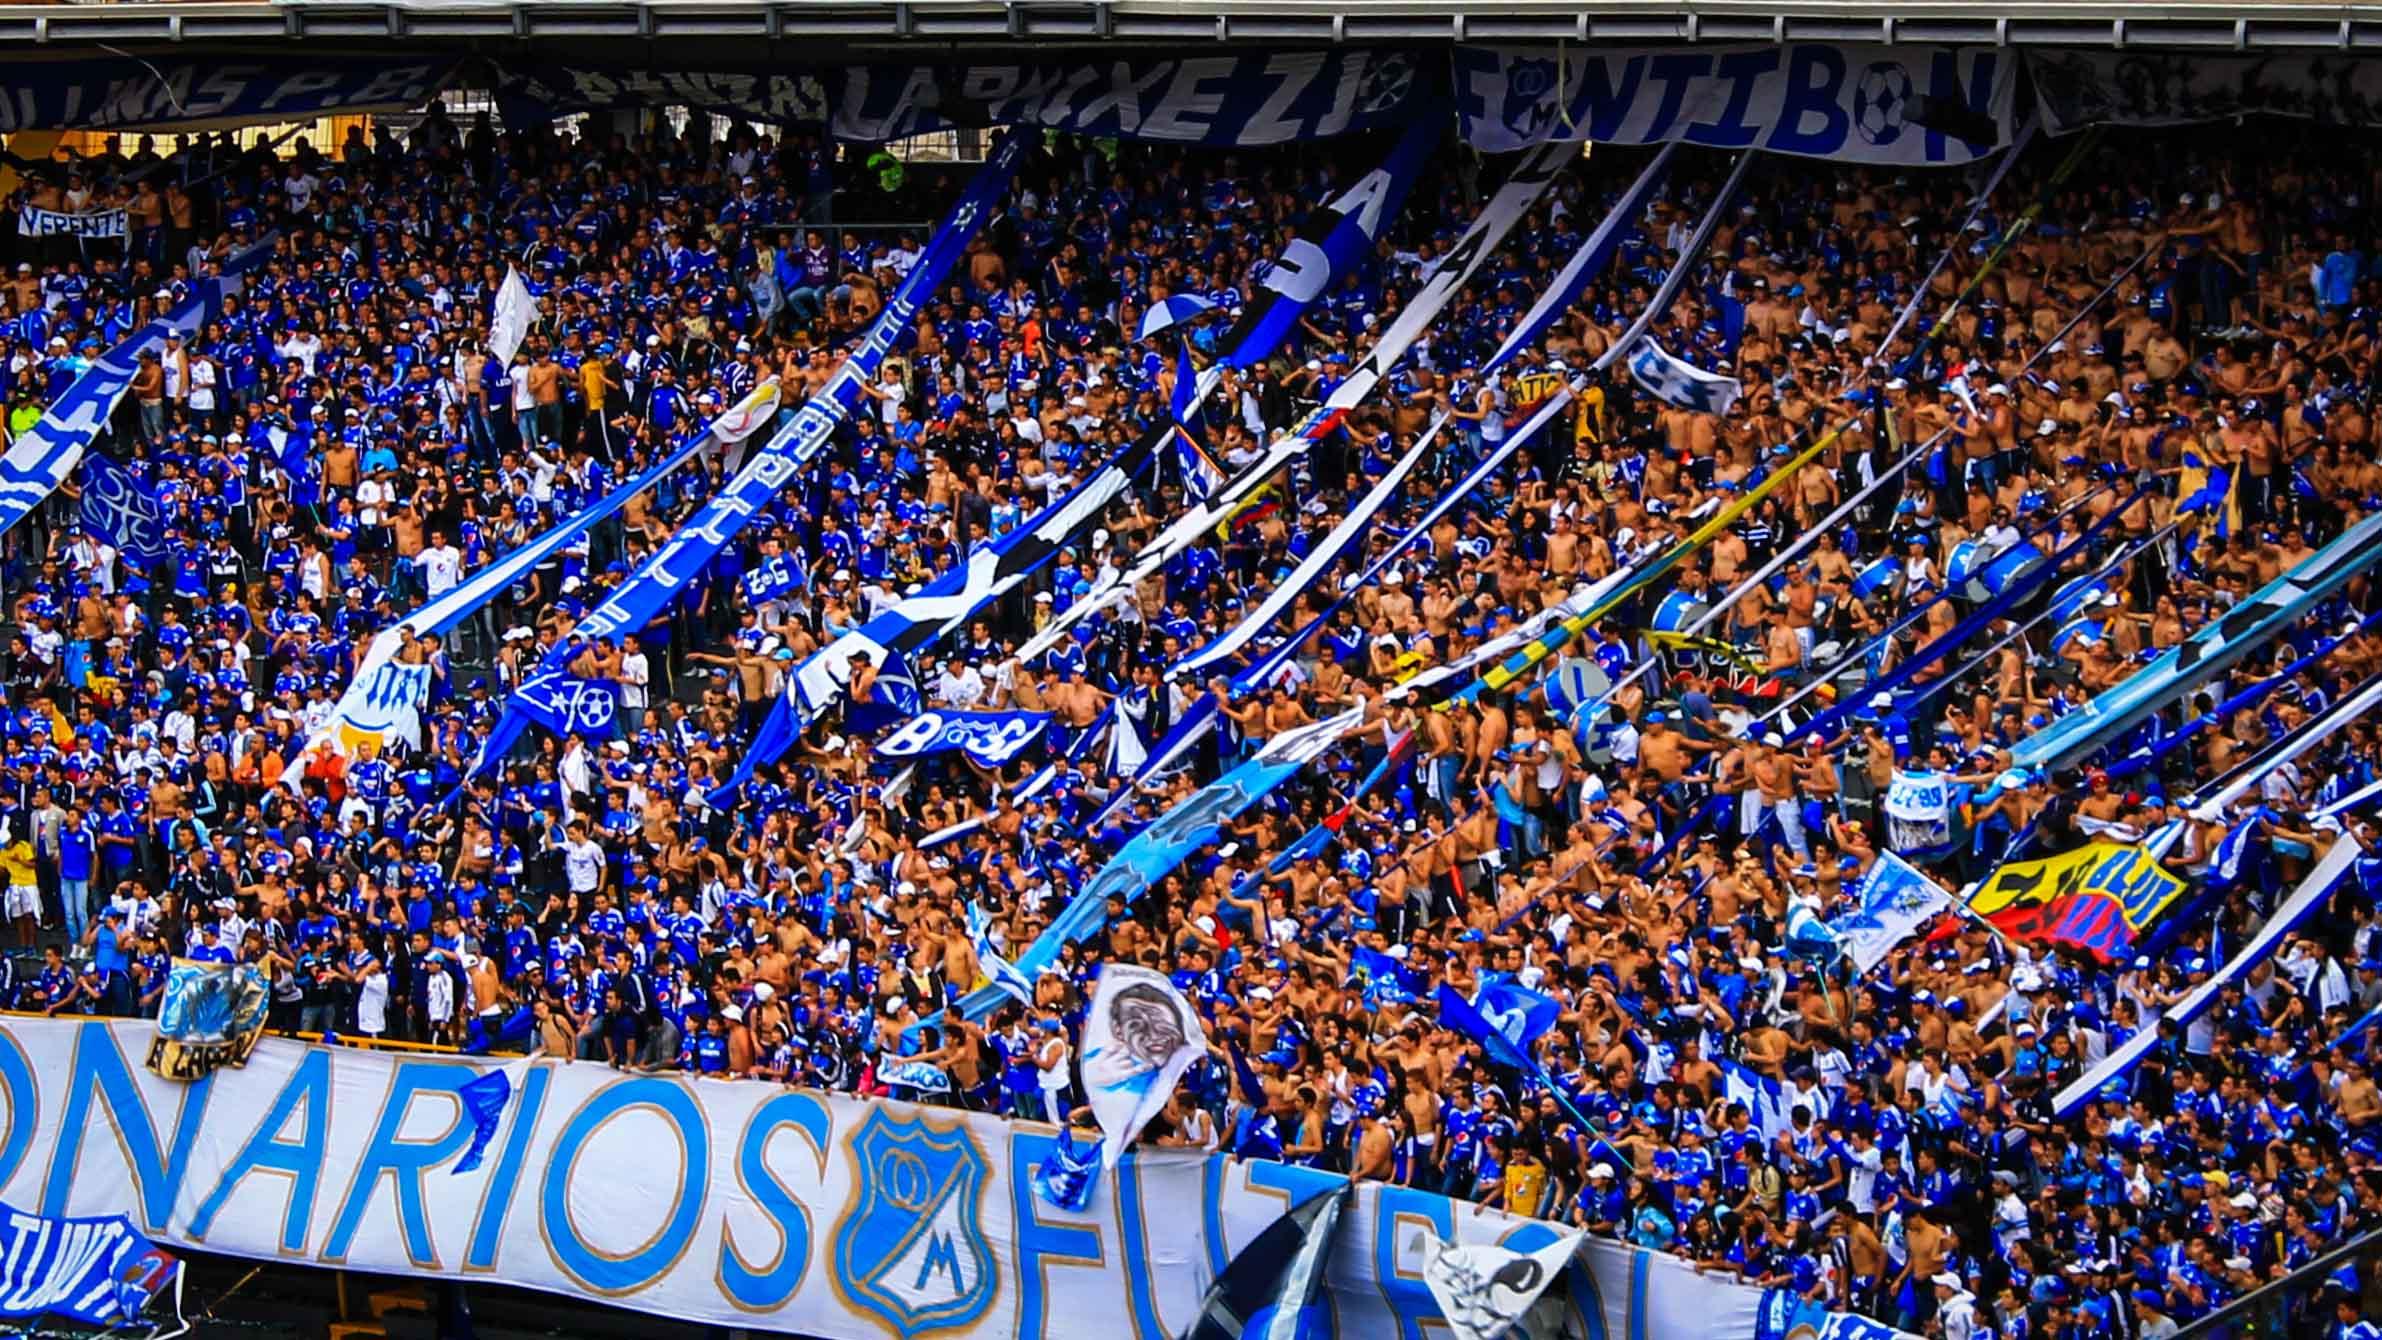 One of Millonarios FC's famed barras bravas, Blue Rain.